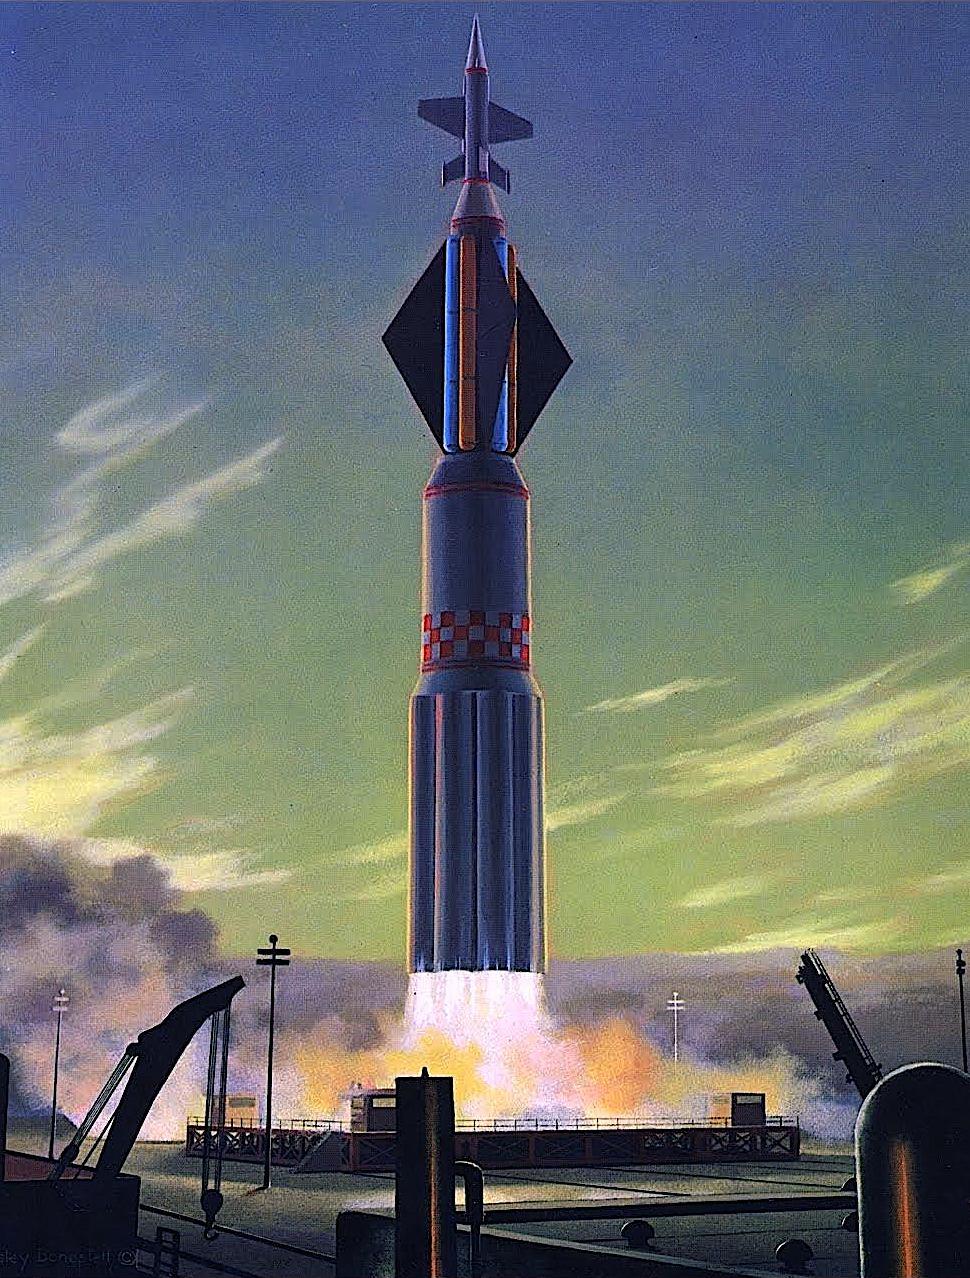 Chesley Bonestell rocket launch